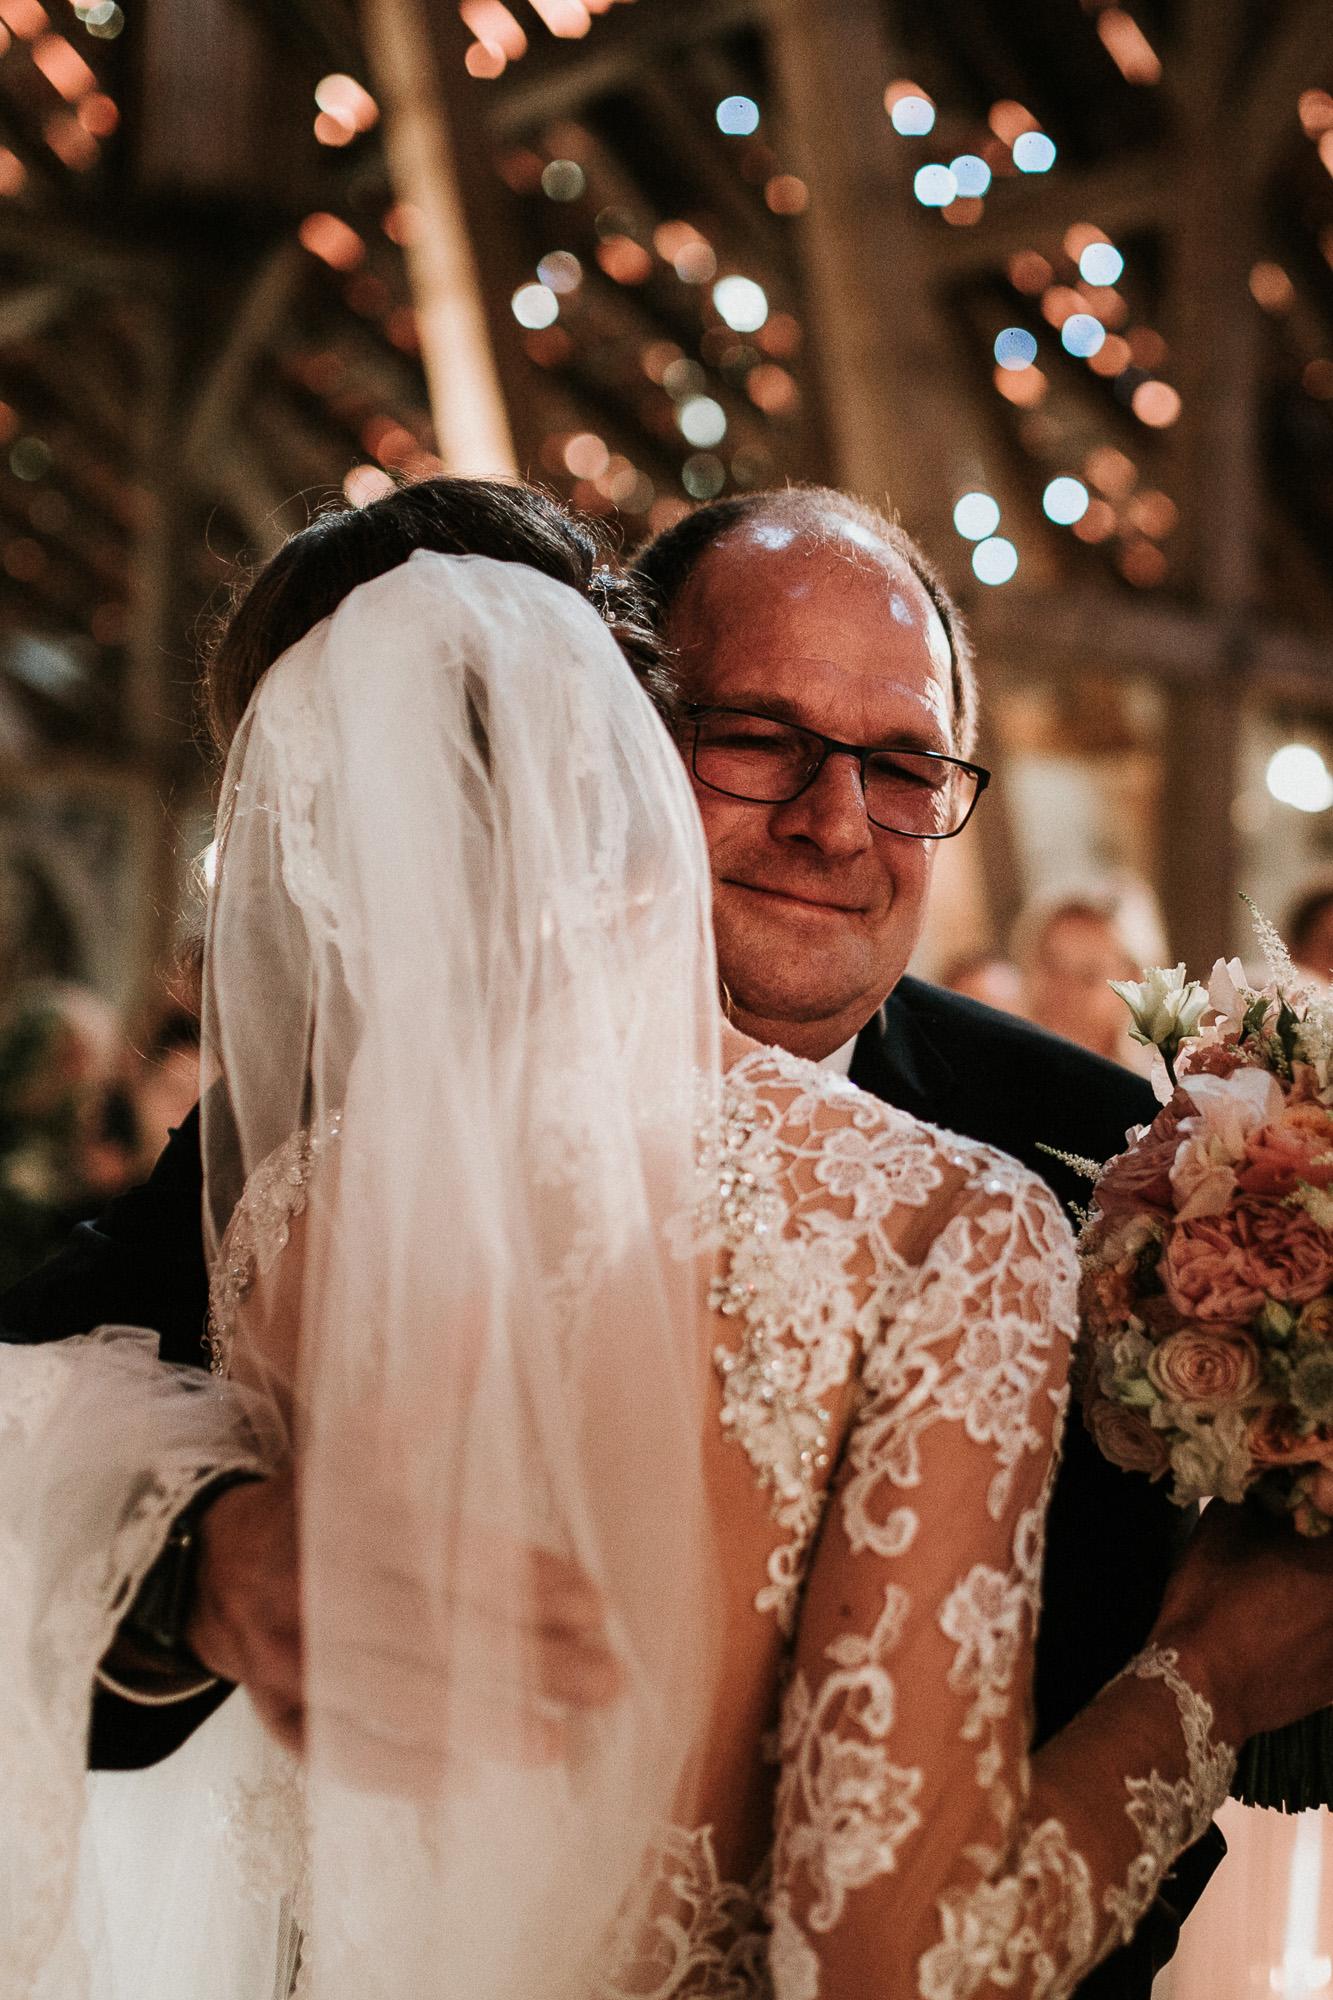 DanielaMarquardtPhotography_Hochzeitsfotograf_Düsseldorf_Köln_Mallorca_Bayern_Austria_Harz_Wedding_AileenundLennart_Weddingphotographer_Ibiza_Tuskany_Italien_Toskana_Portugal_Lissabon115